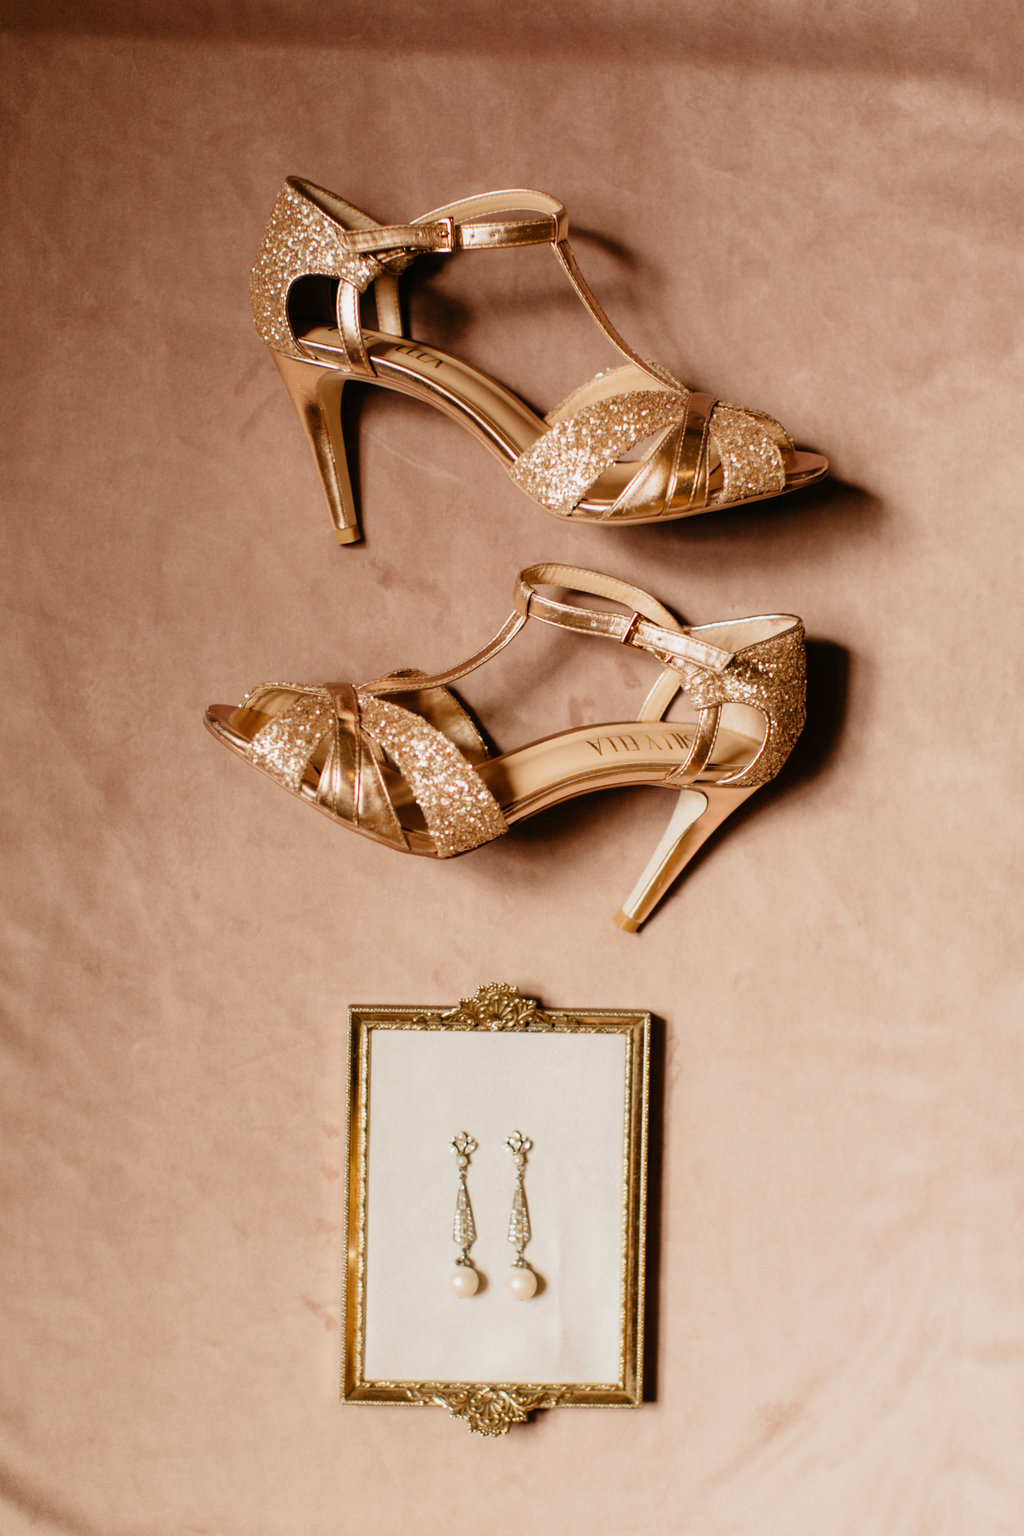 Paxton Ballroom Omaha Nebraska Midwest Wedding Shoes Earrings